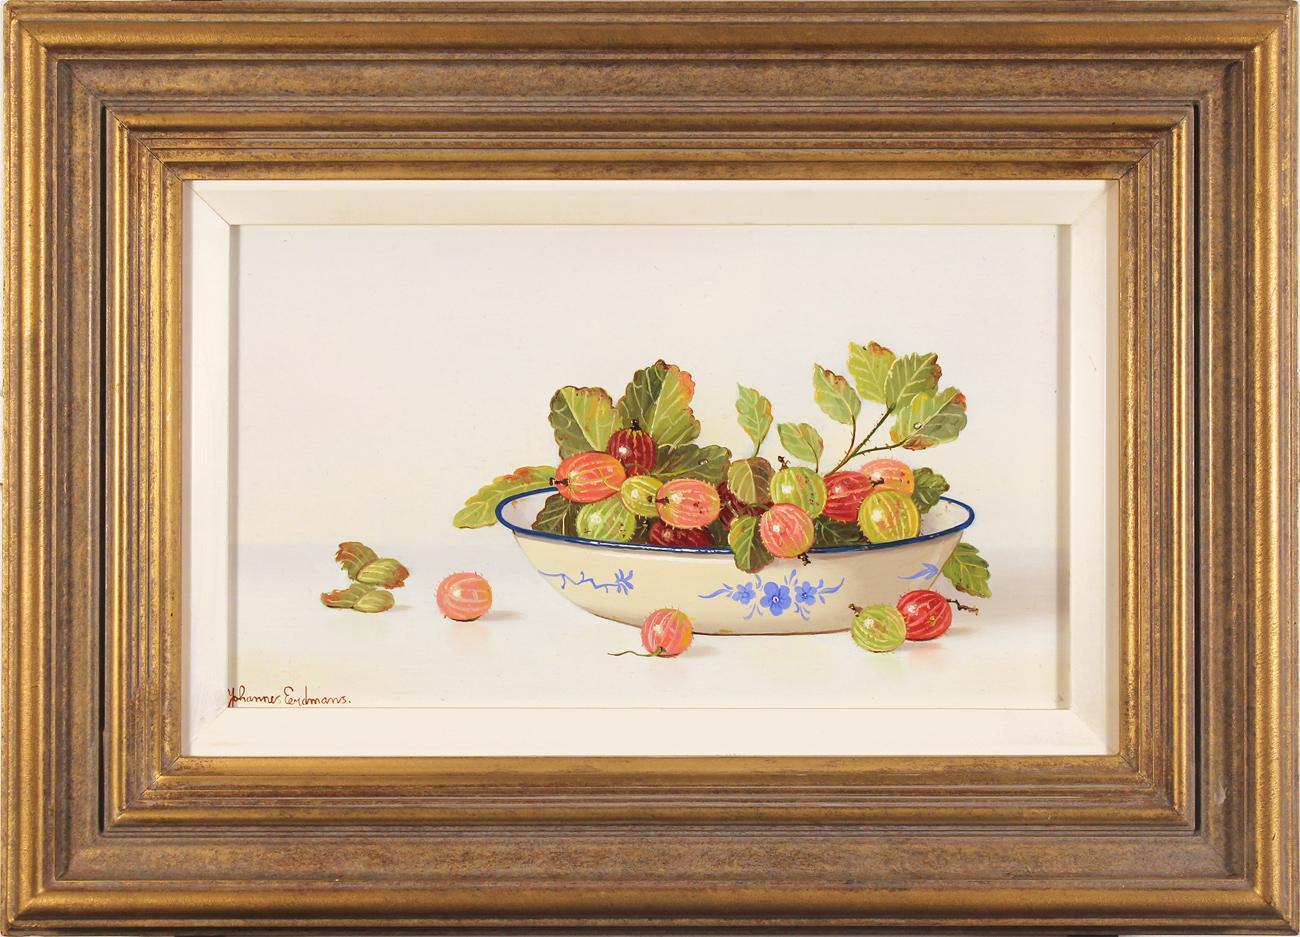 Johannes Eerdmans, Original oil painting on panel, Berries, click to enlarge